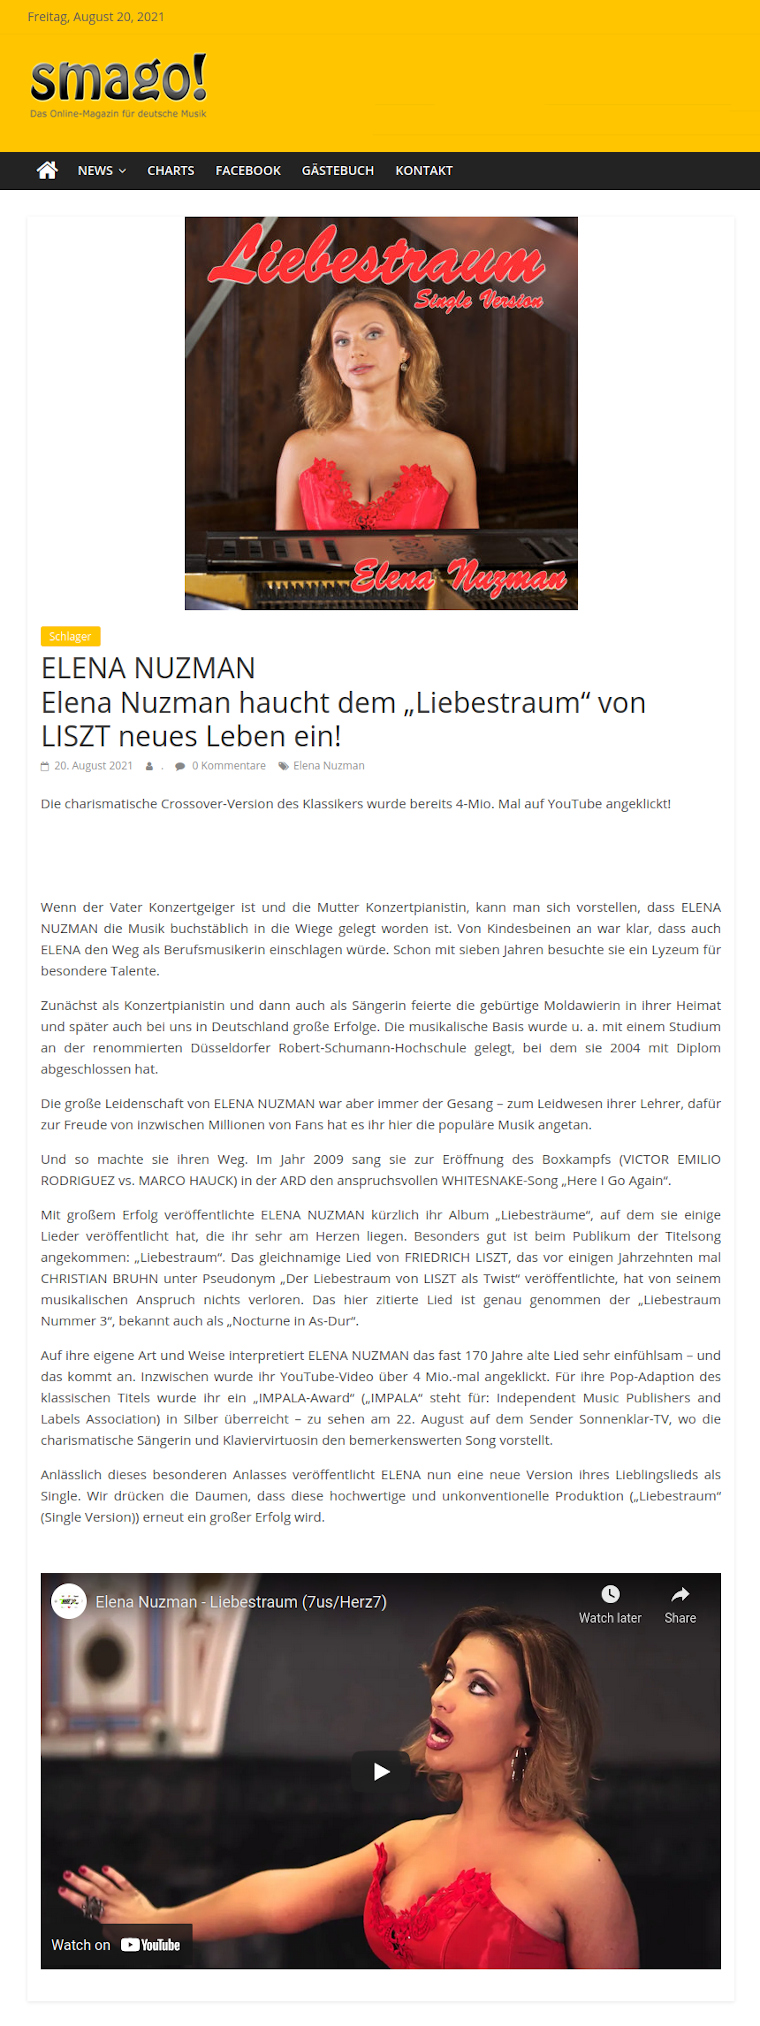 Elena Nuzman - Aktuell - smago.de - August 2021